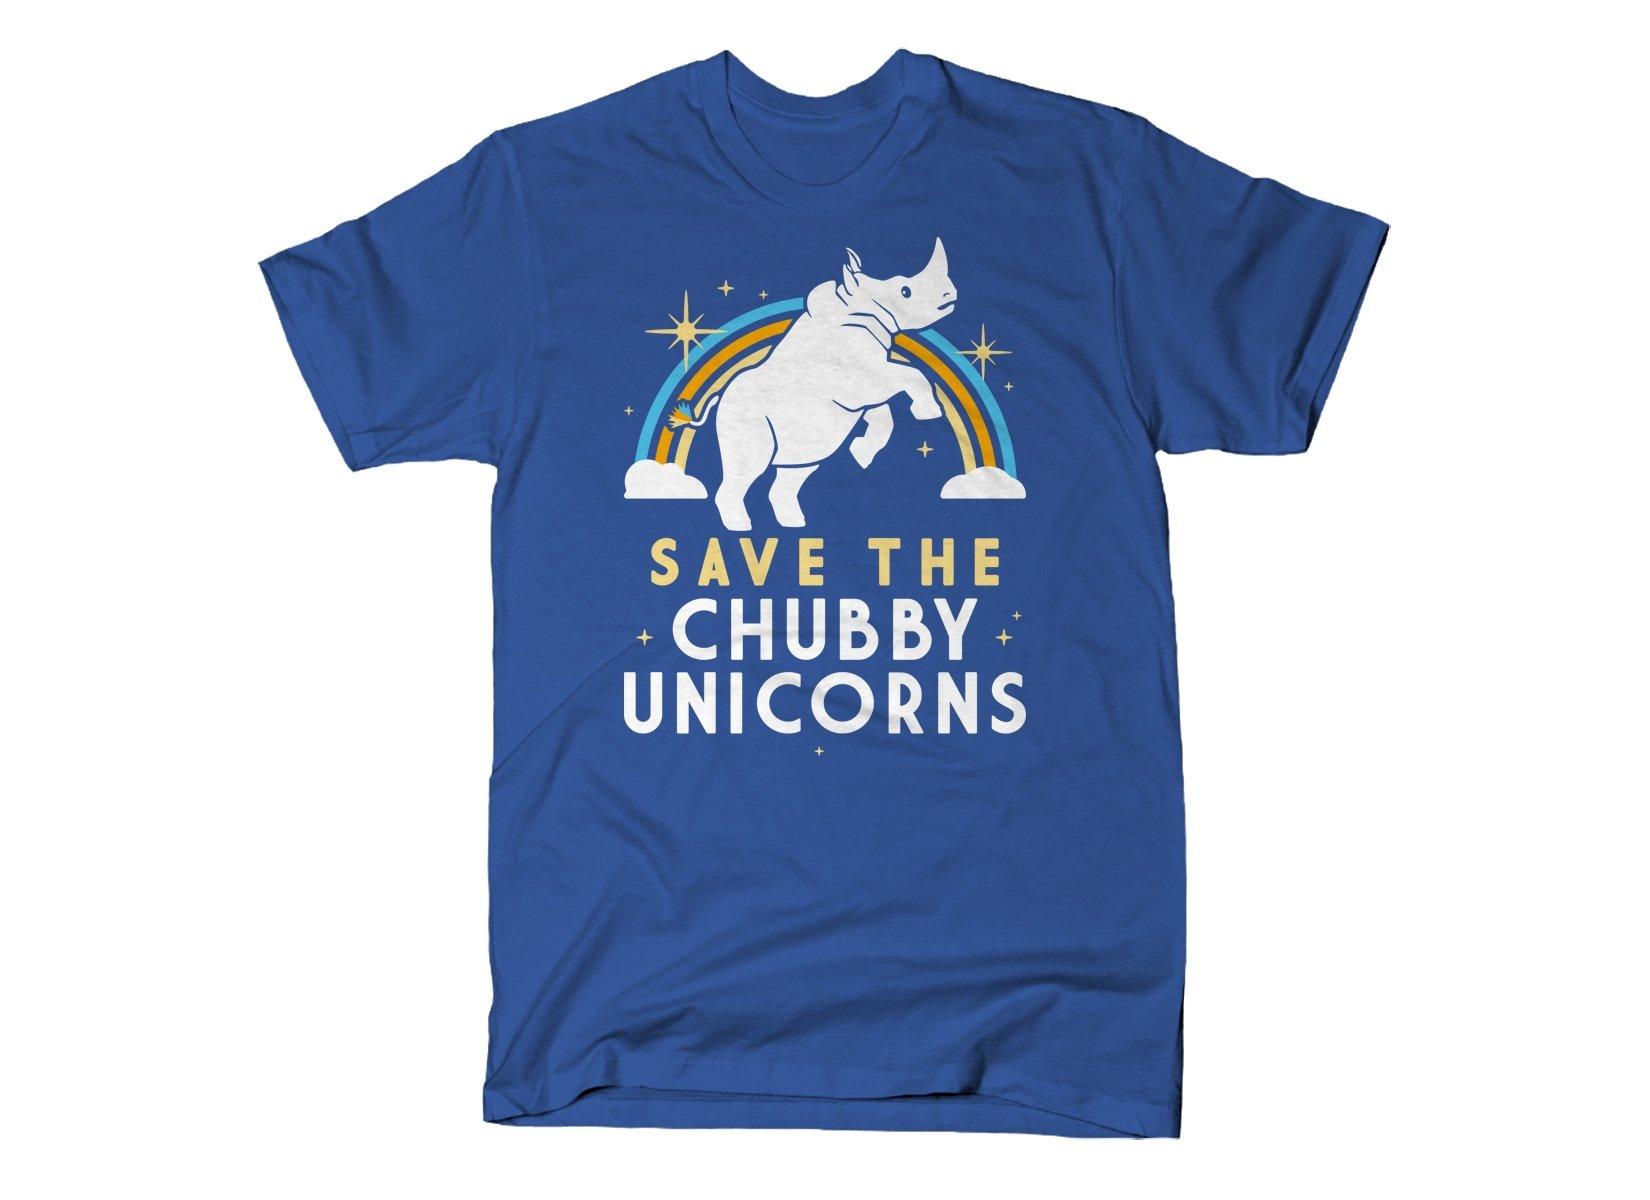 Save The Chubby Unicorns on Mens T-Shirt